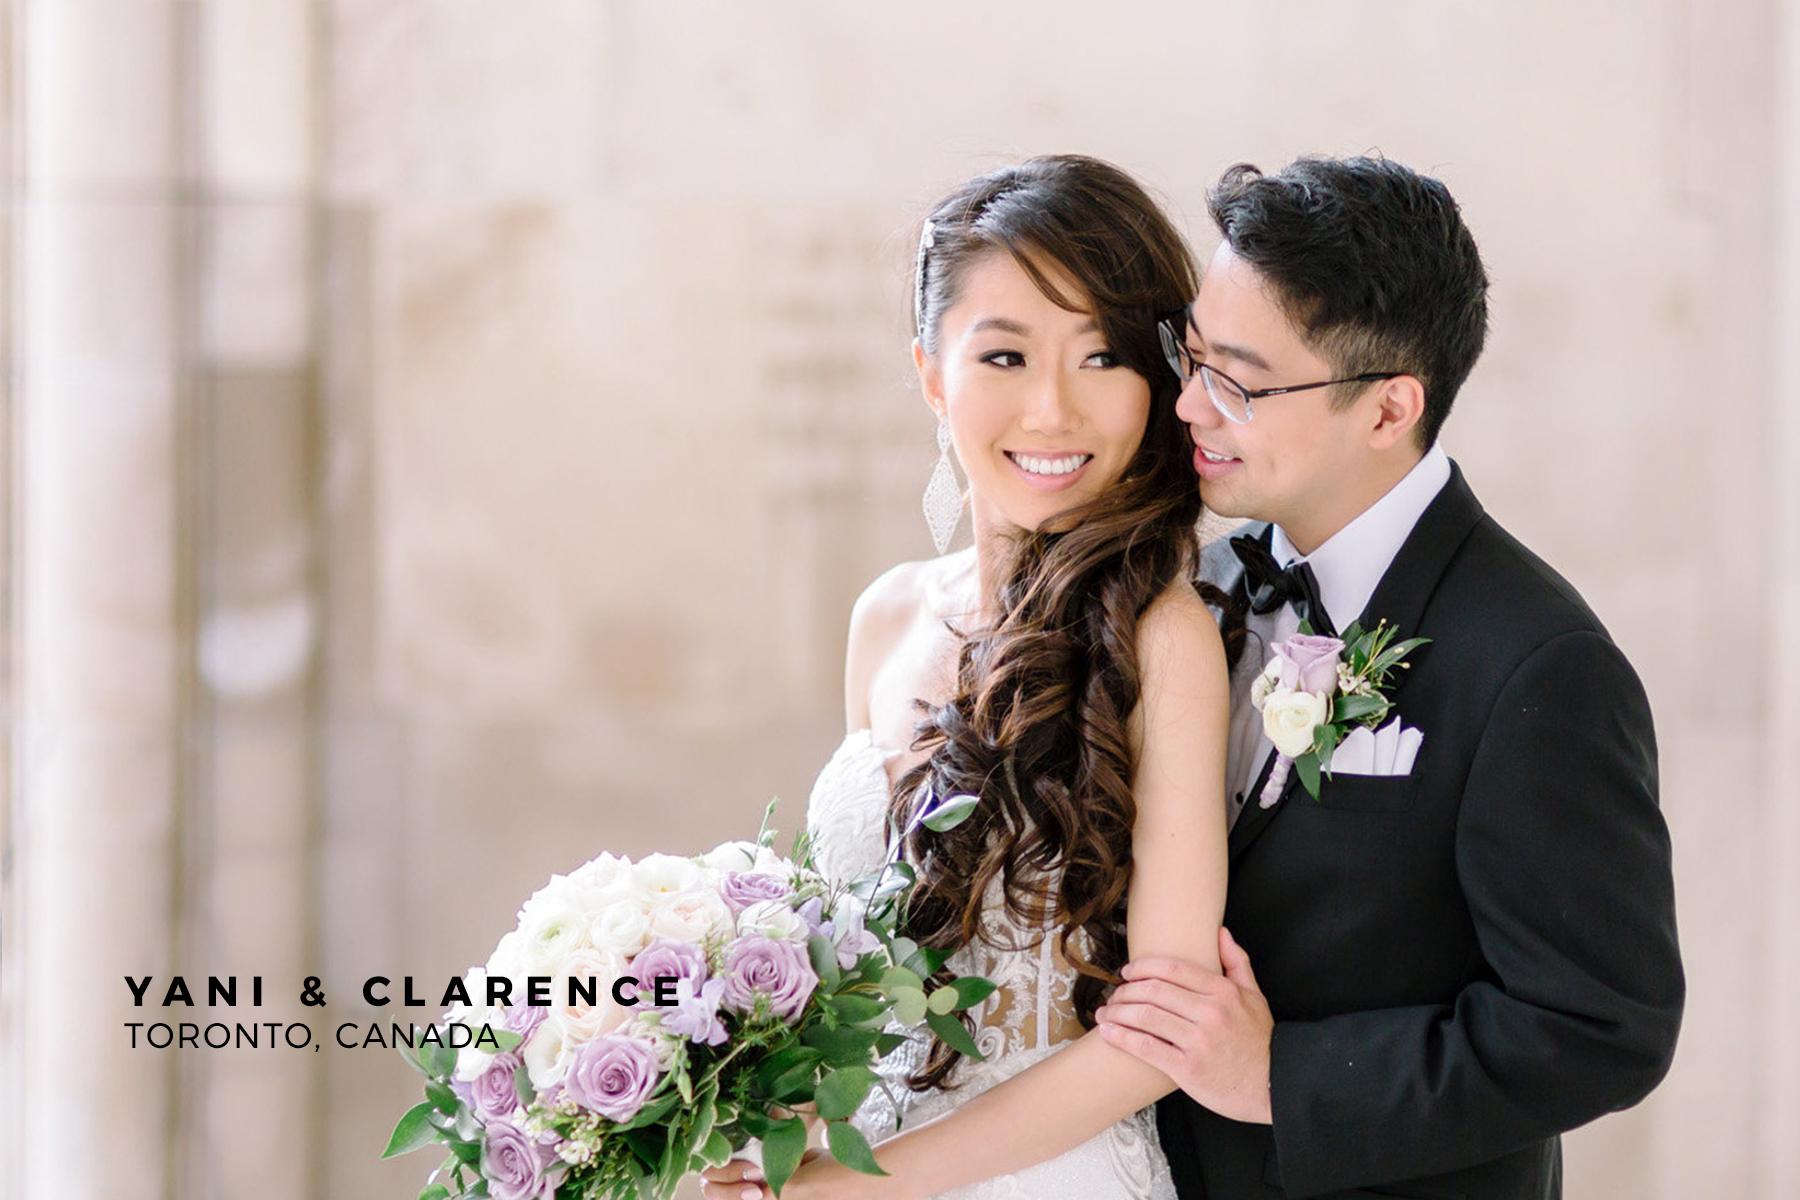 Yani and Clarence